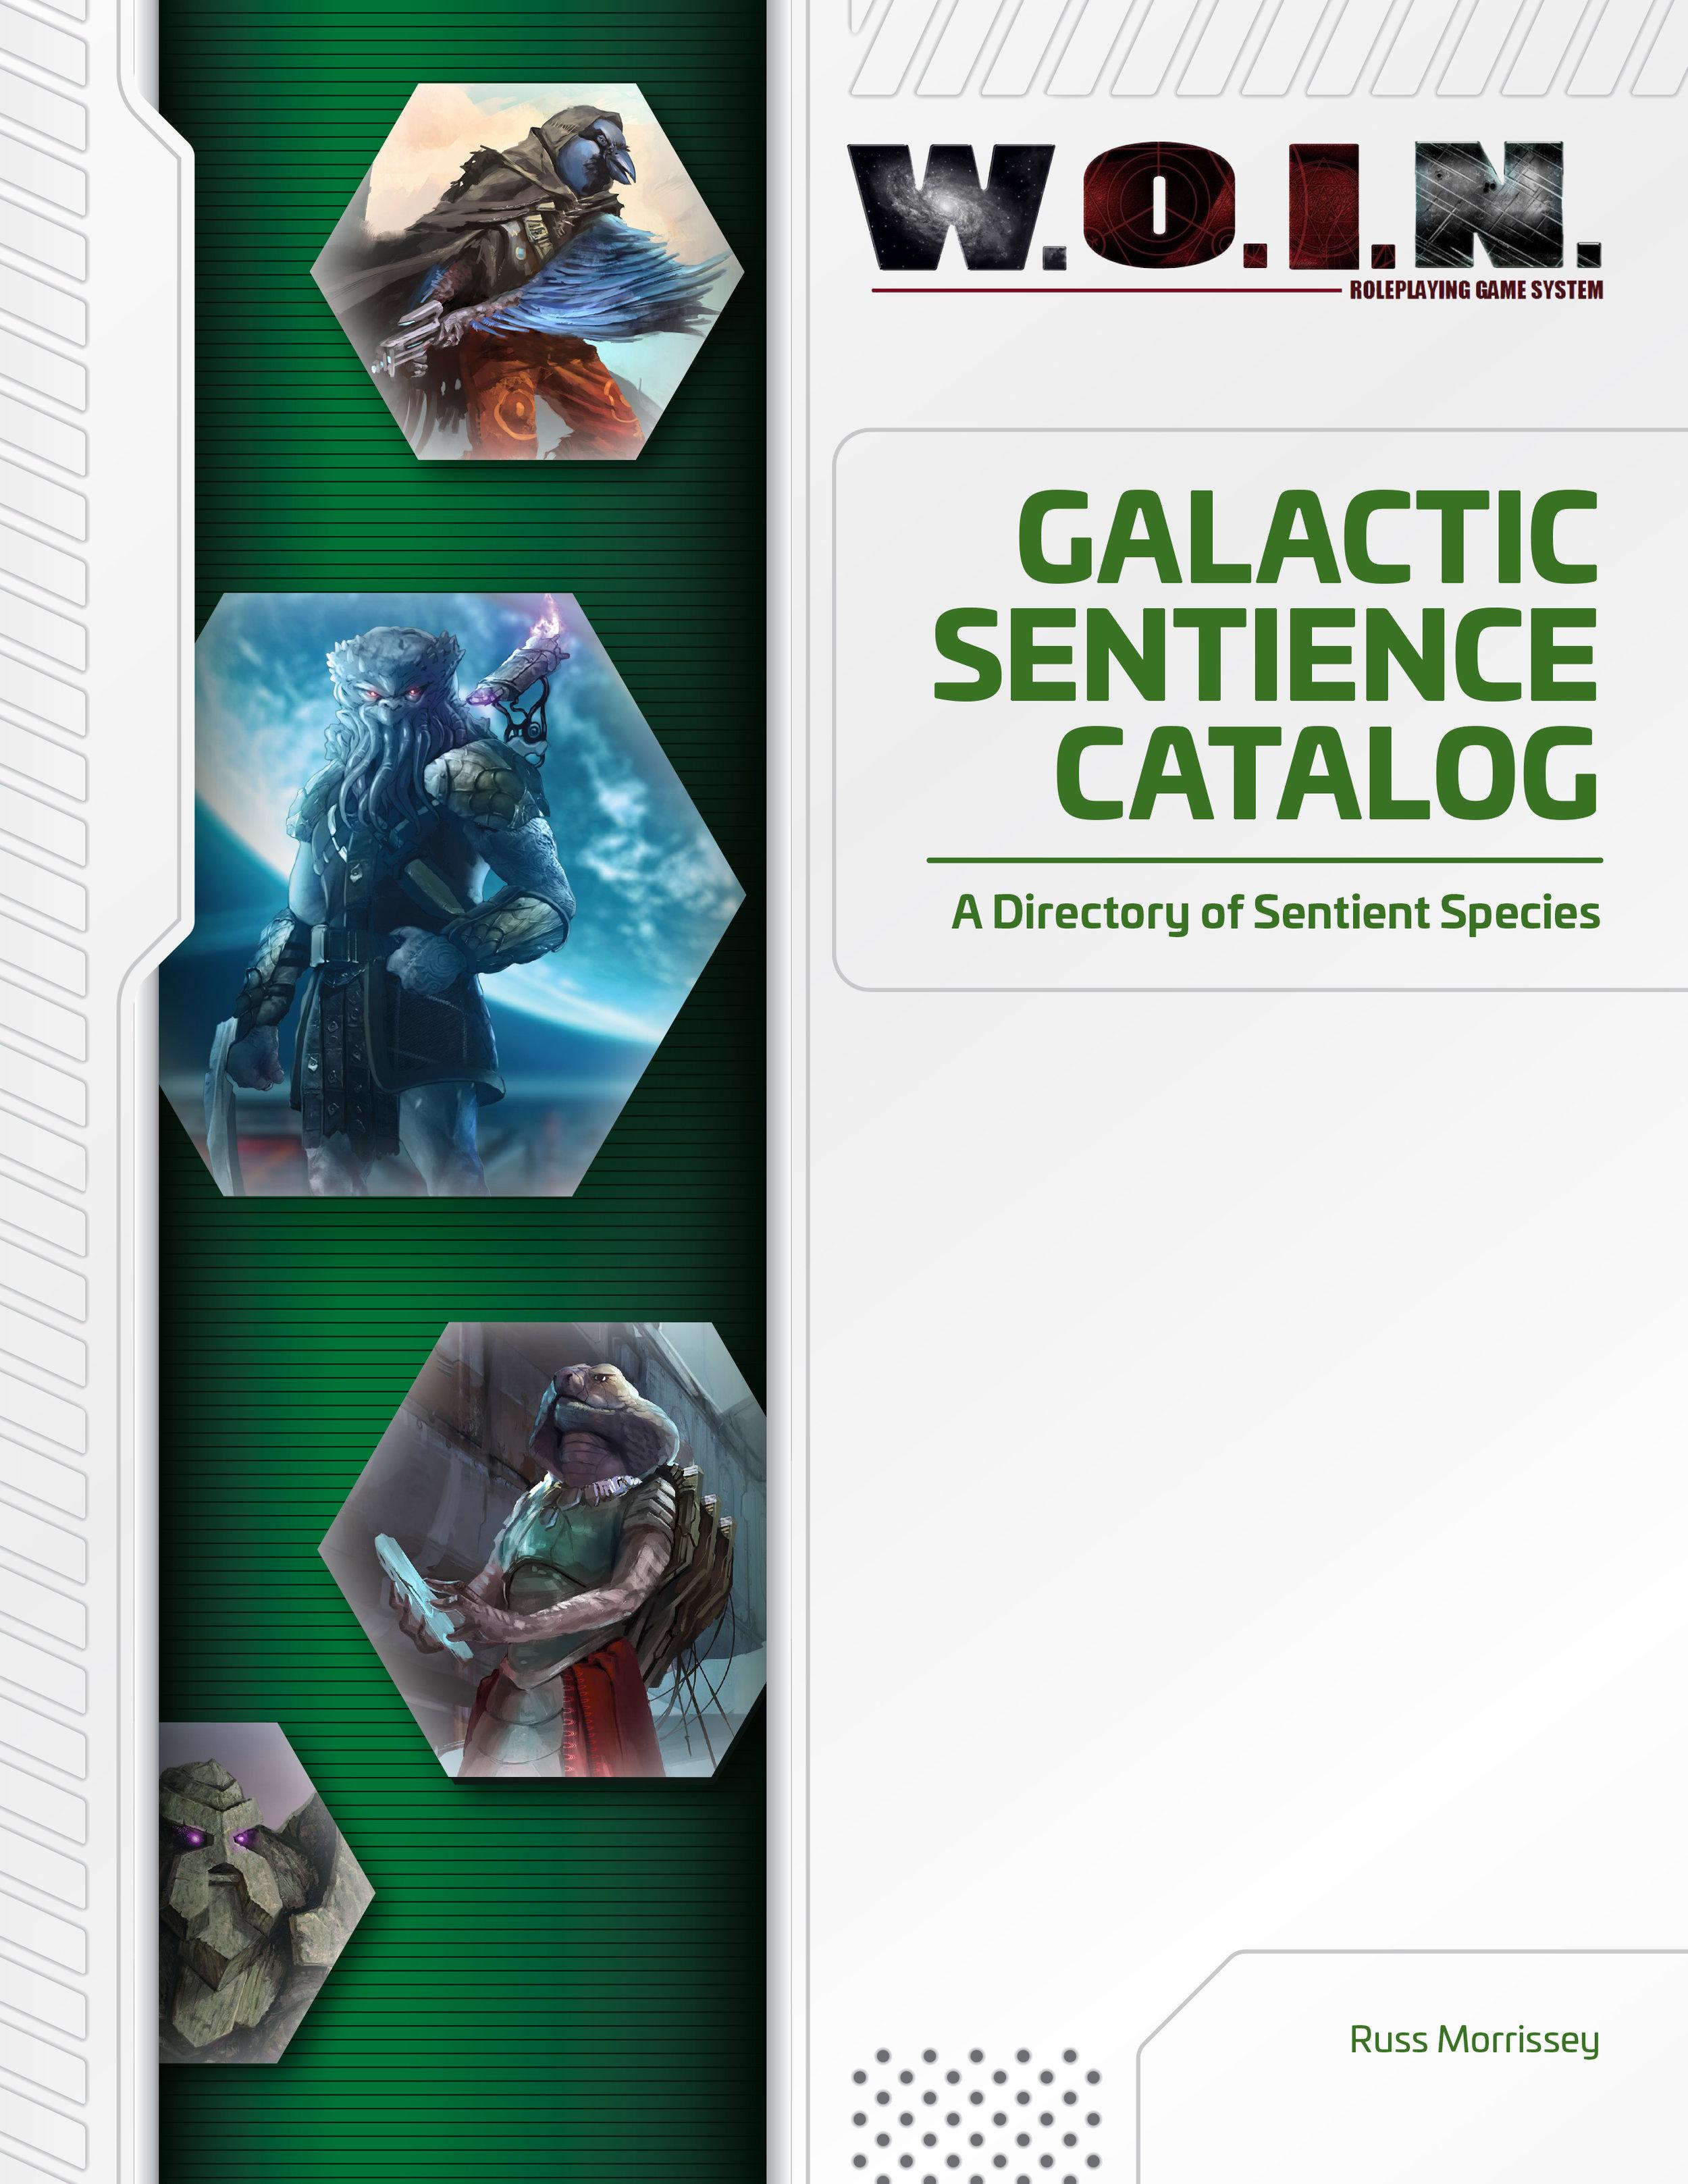 WOIN_Galactic_Sentience_Catalog_Cover_01-1.jpg